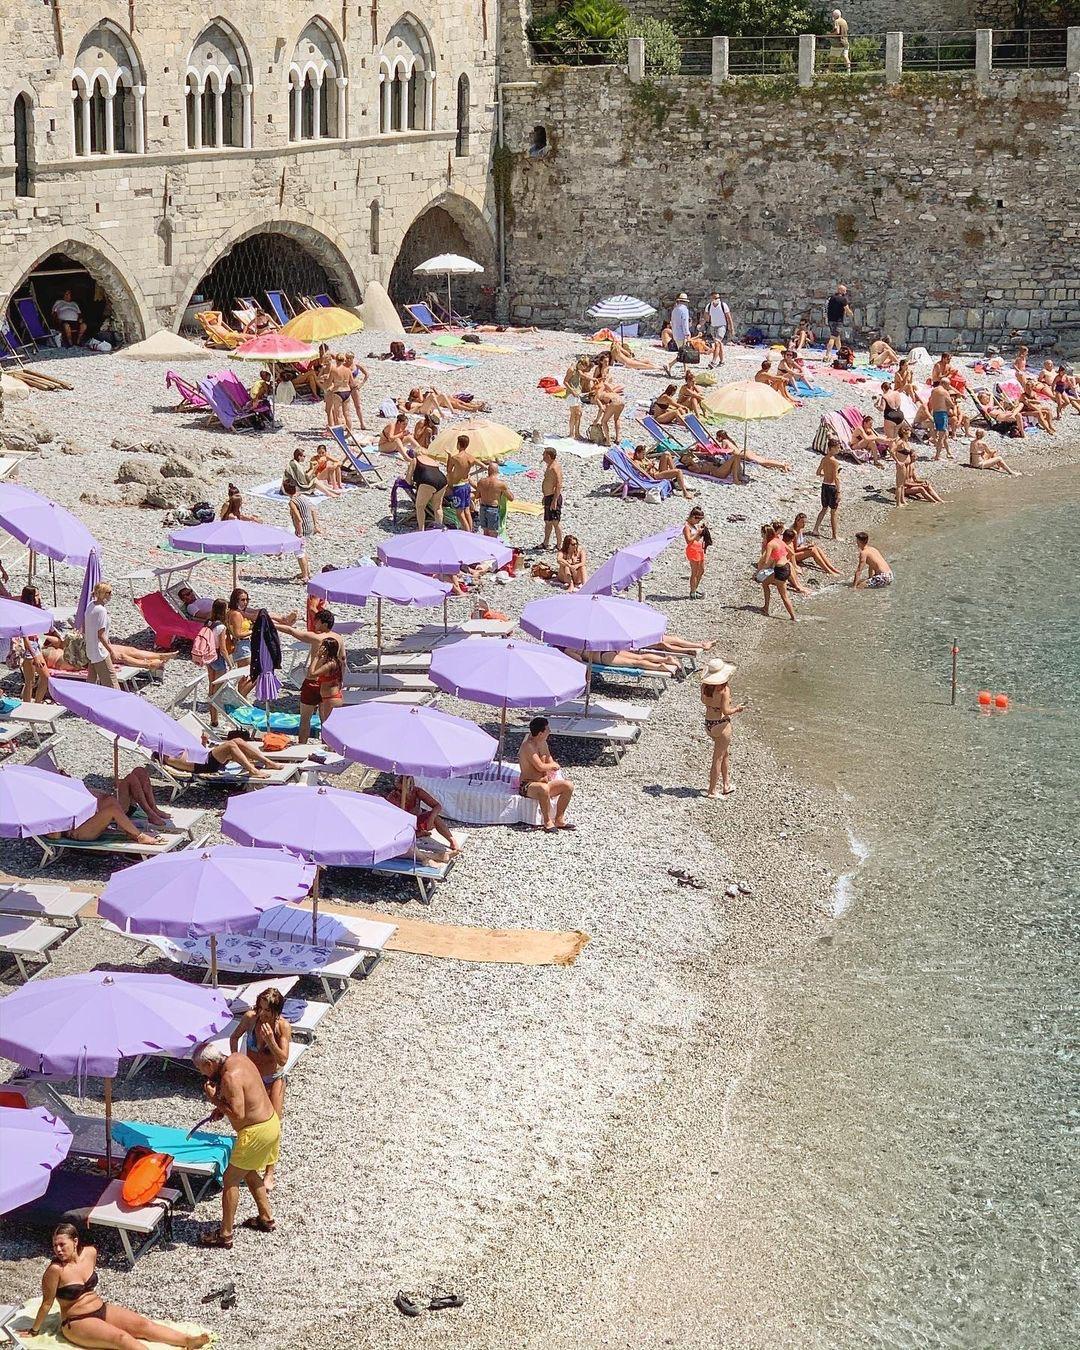 San Fruttuoso, Liguria, Italy